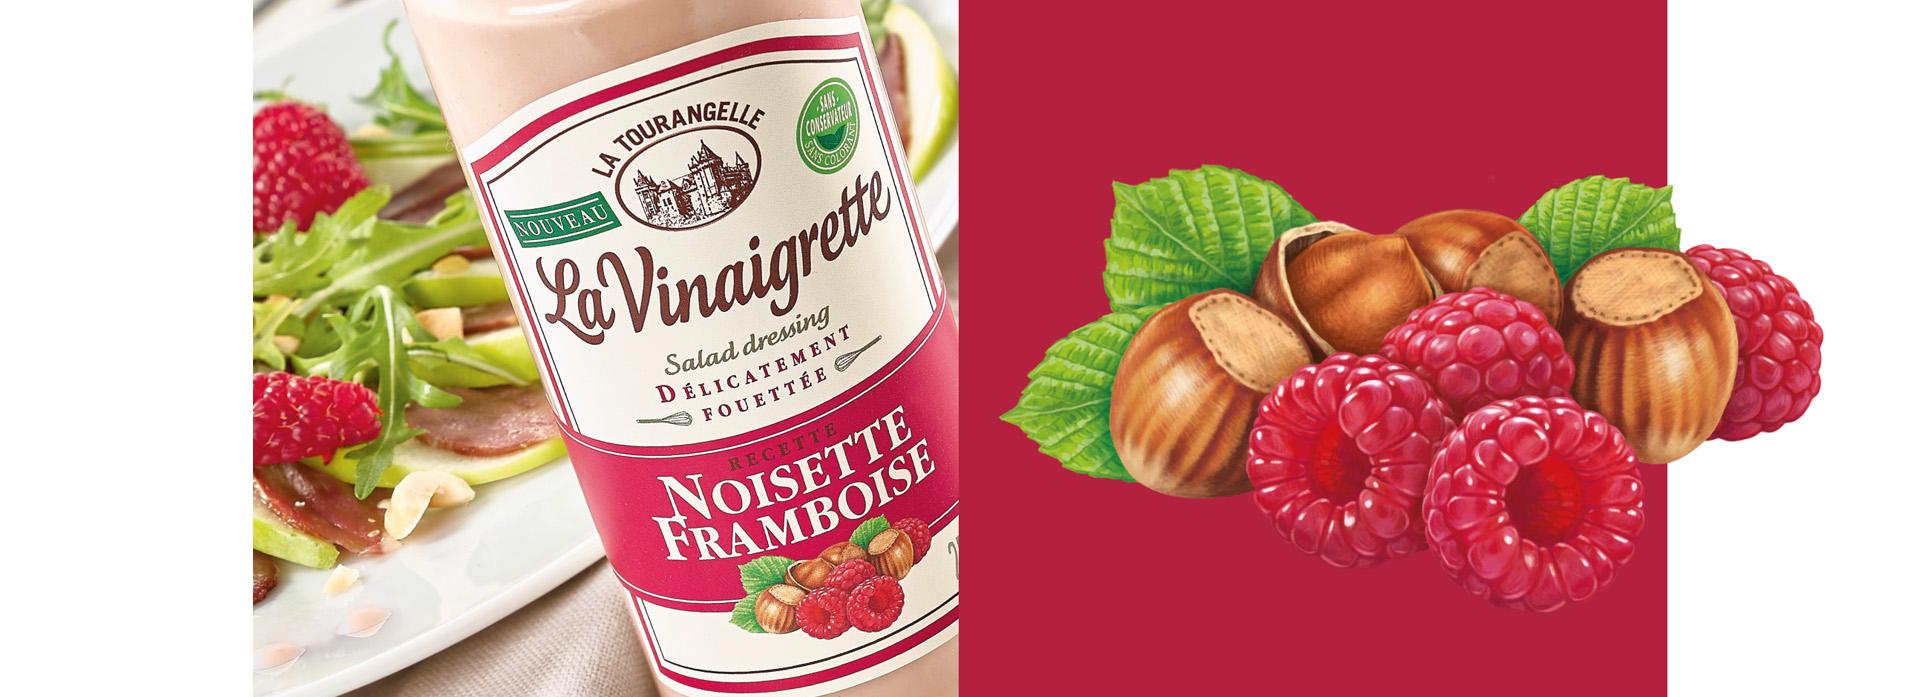 noisette framboise Vinaigrette packaging la tourangelle VIKIU